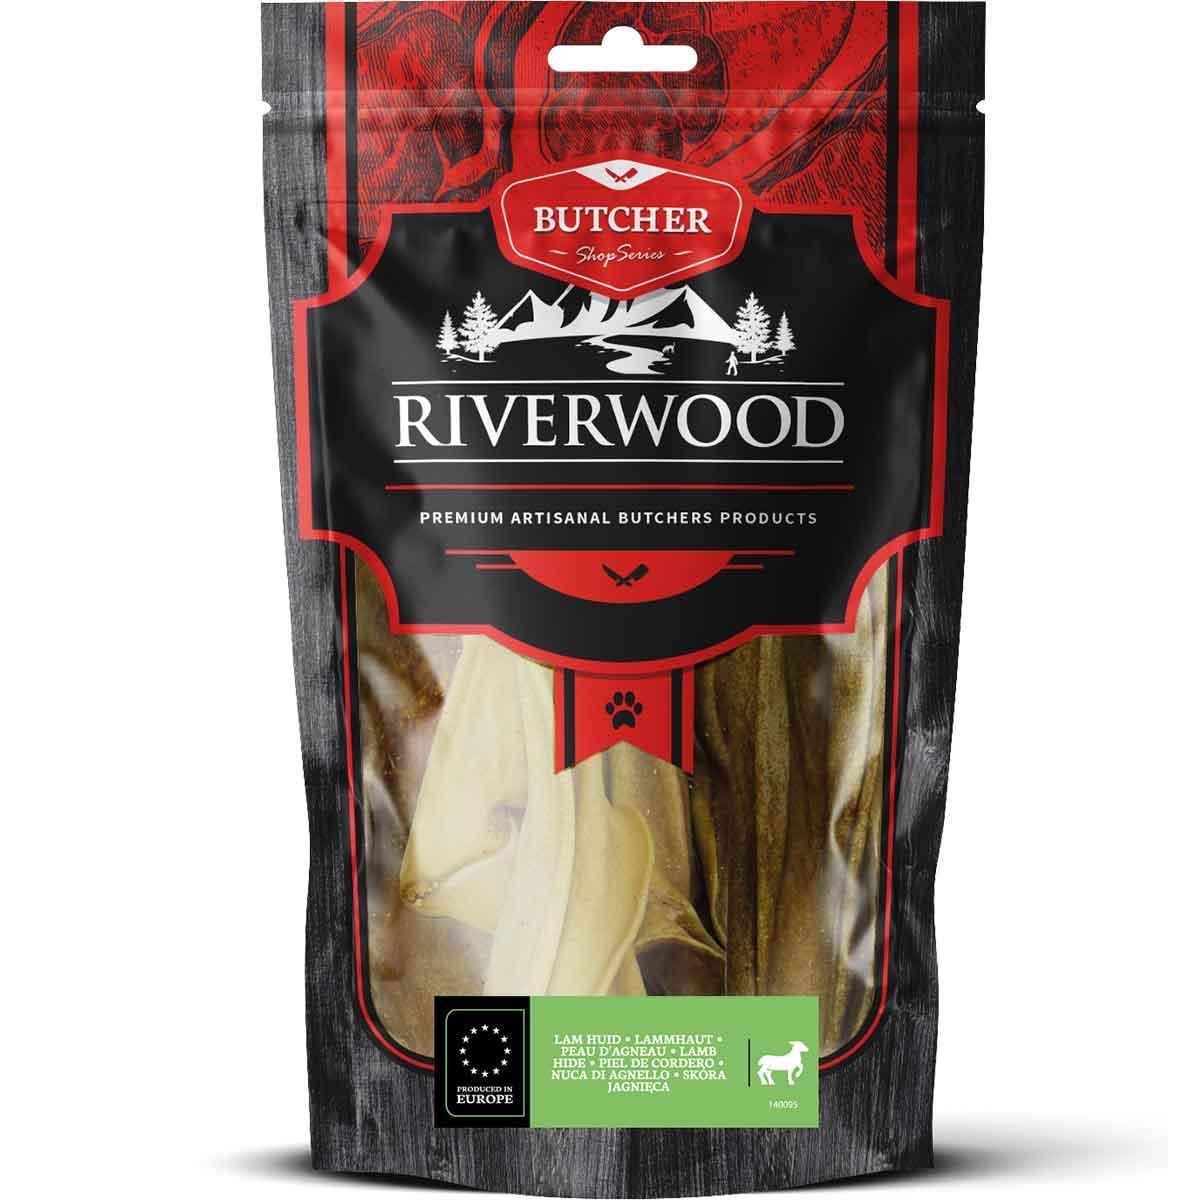 Riverwood Lamshuid